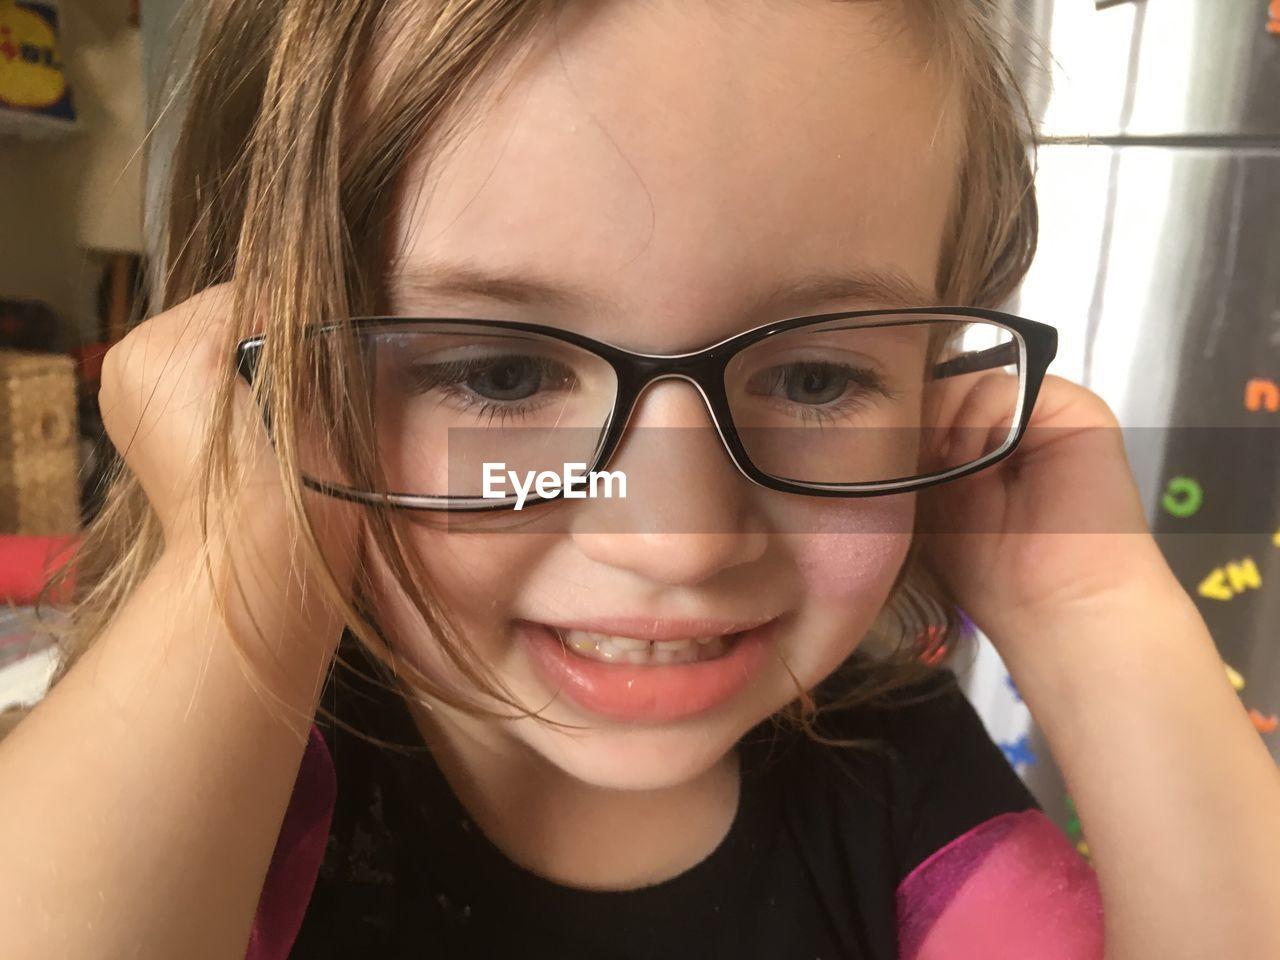 Close-up of smiling girl wearing eyeglasses looking away at home